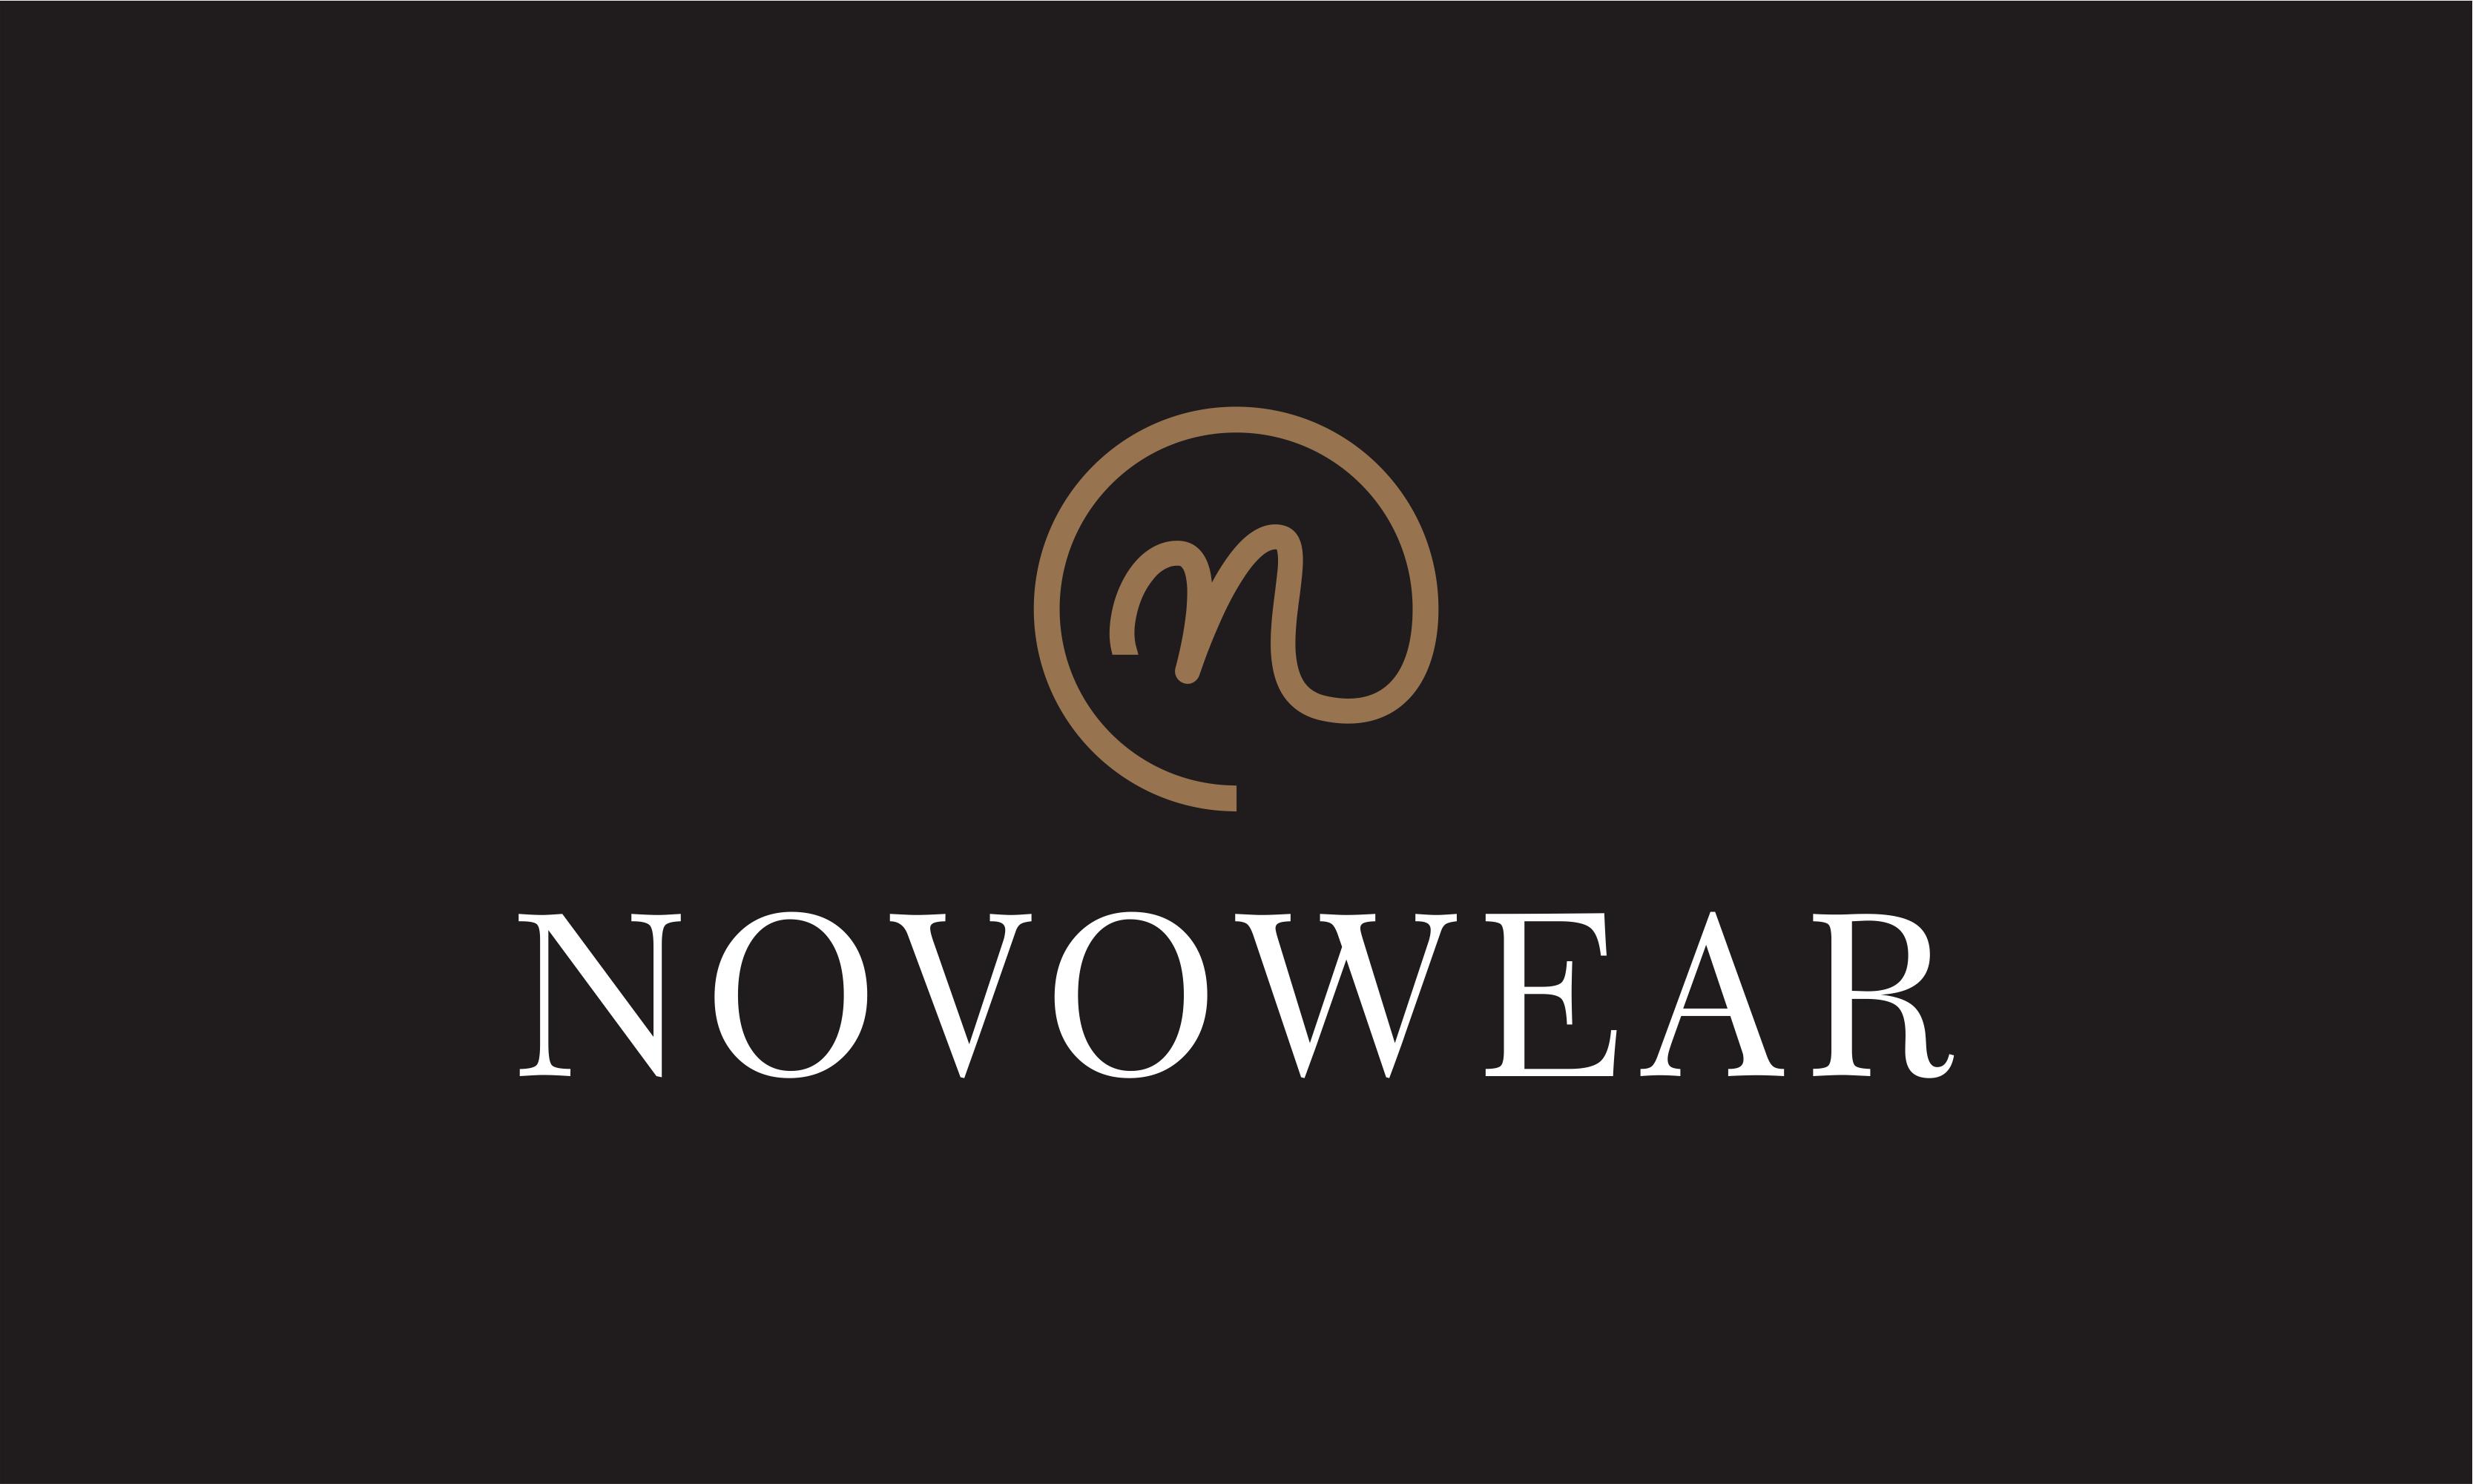 Novowear